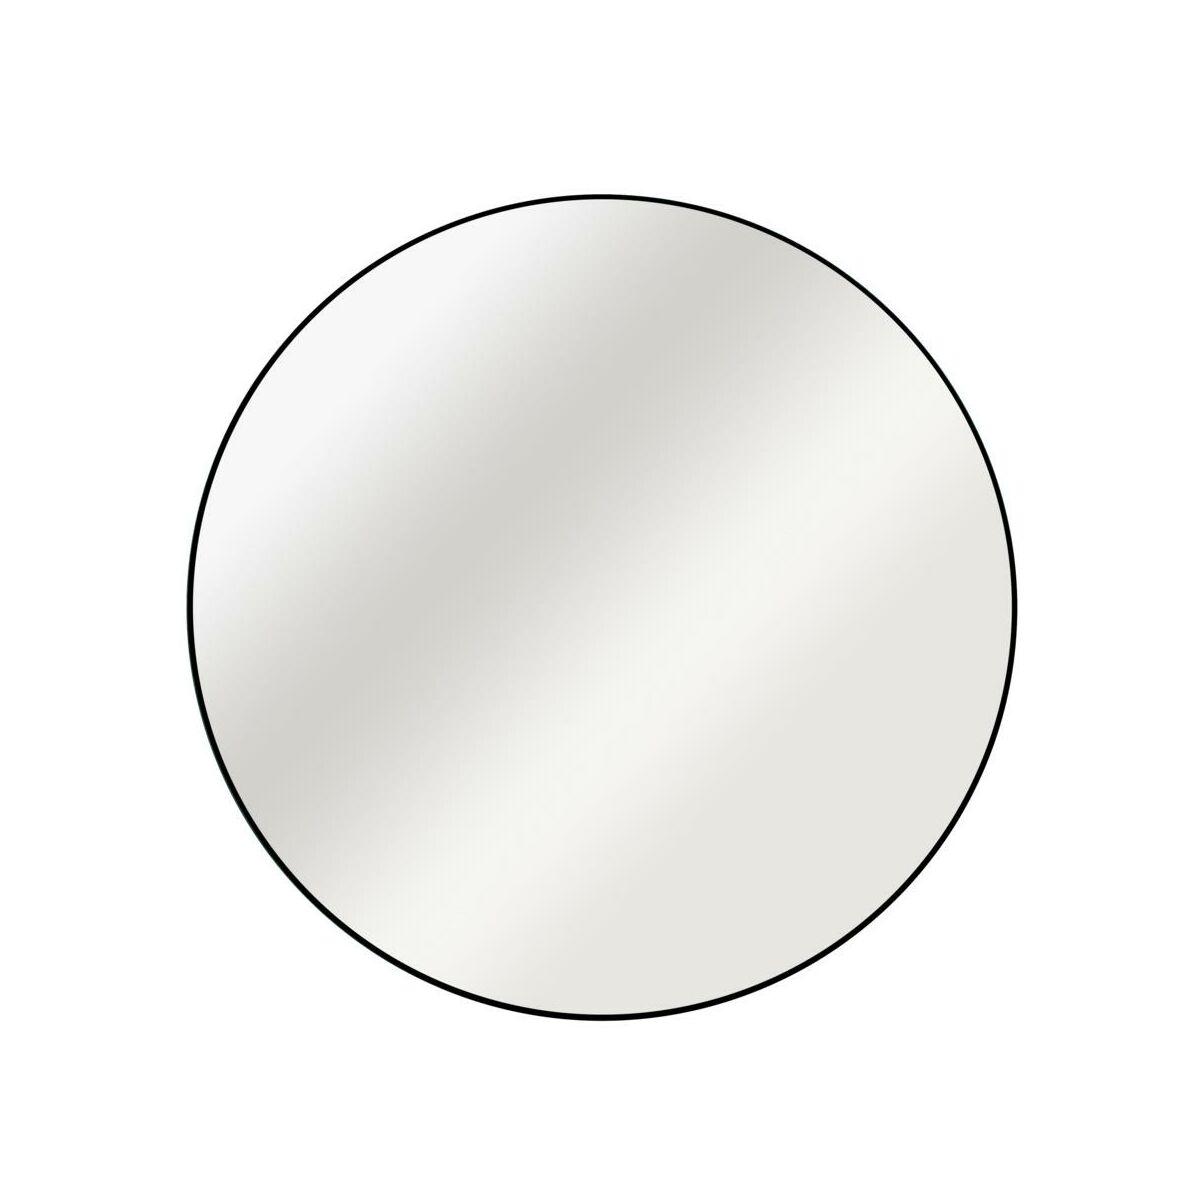 Lustro Okrągłe Circle Czarne śr 50 Cm Inspire